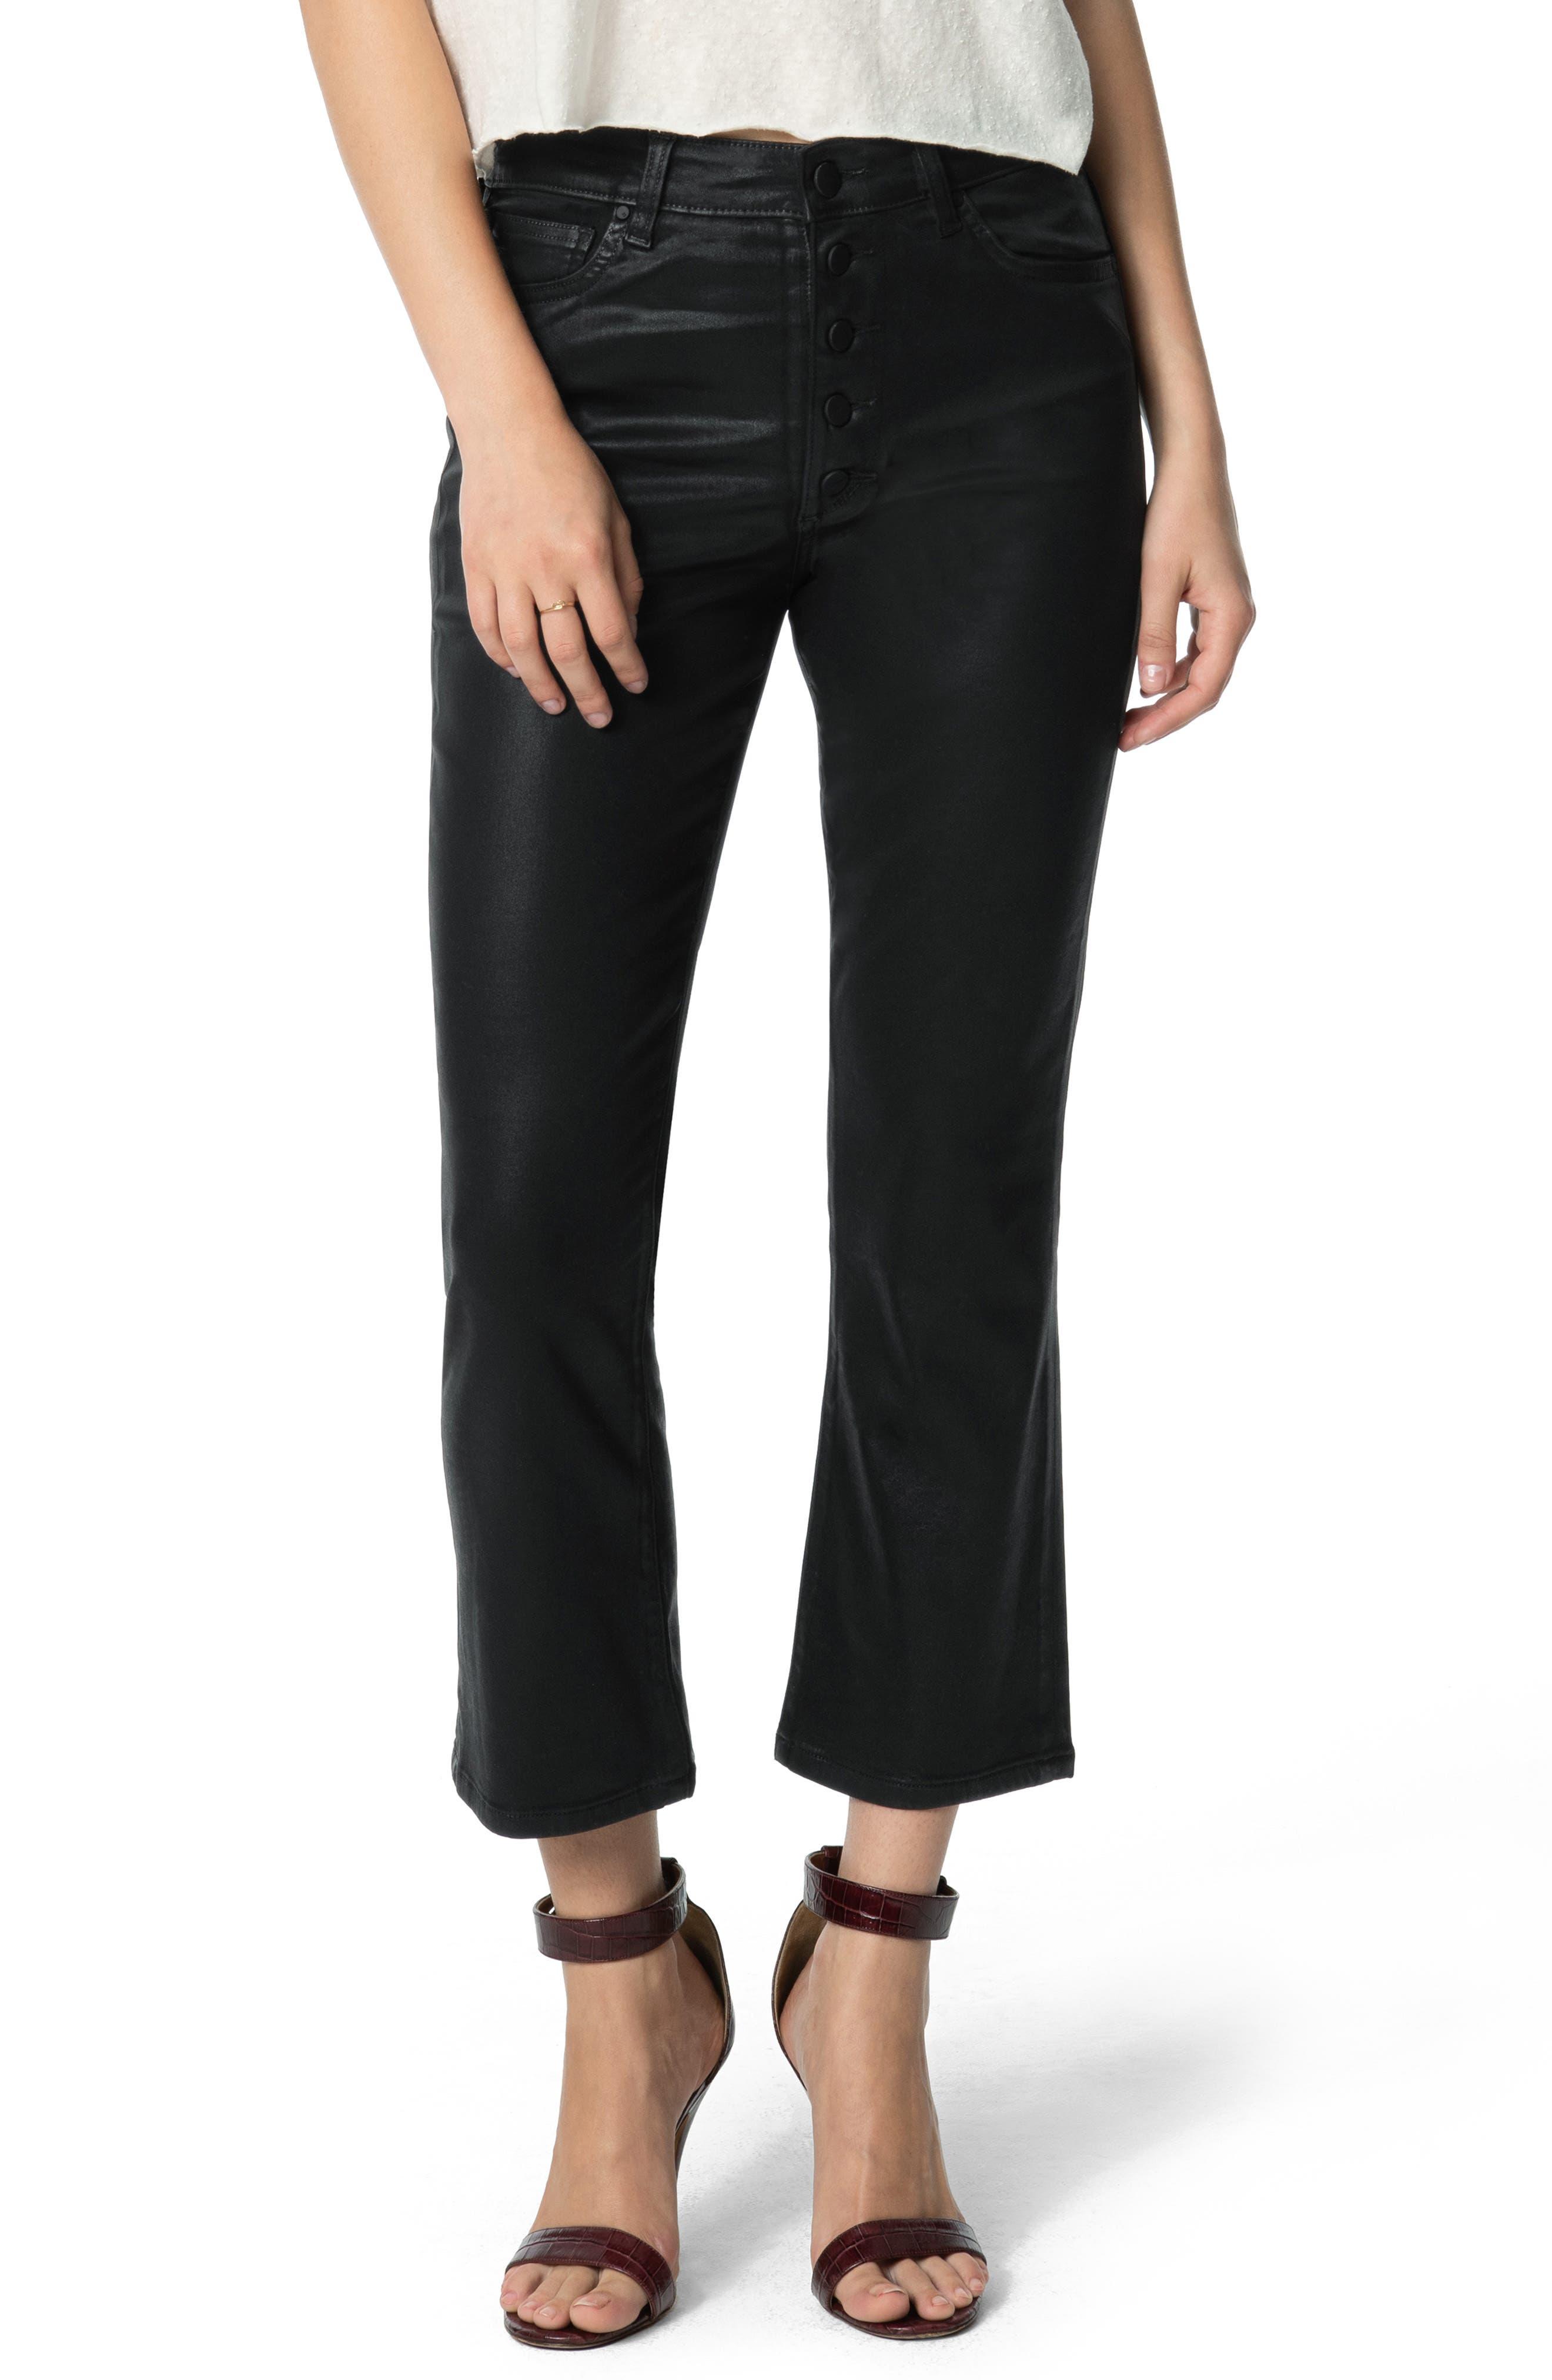 Joe's Coats The Callie Coated High Waist Crop Flare Jeans